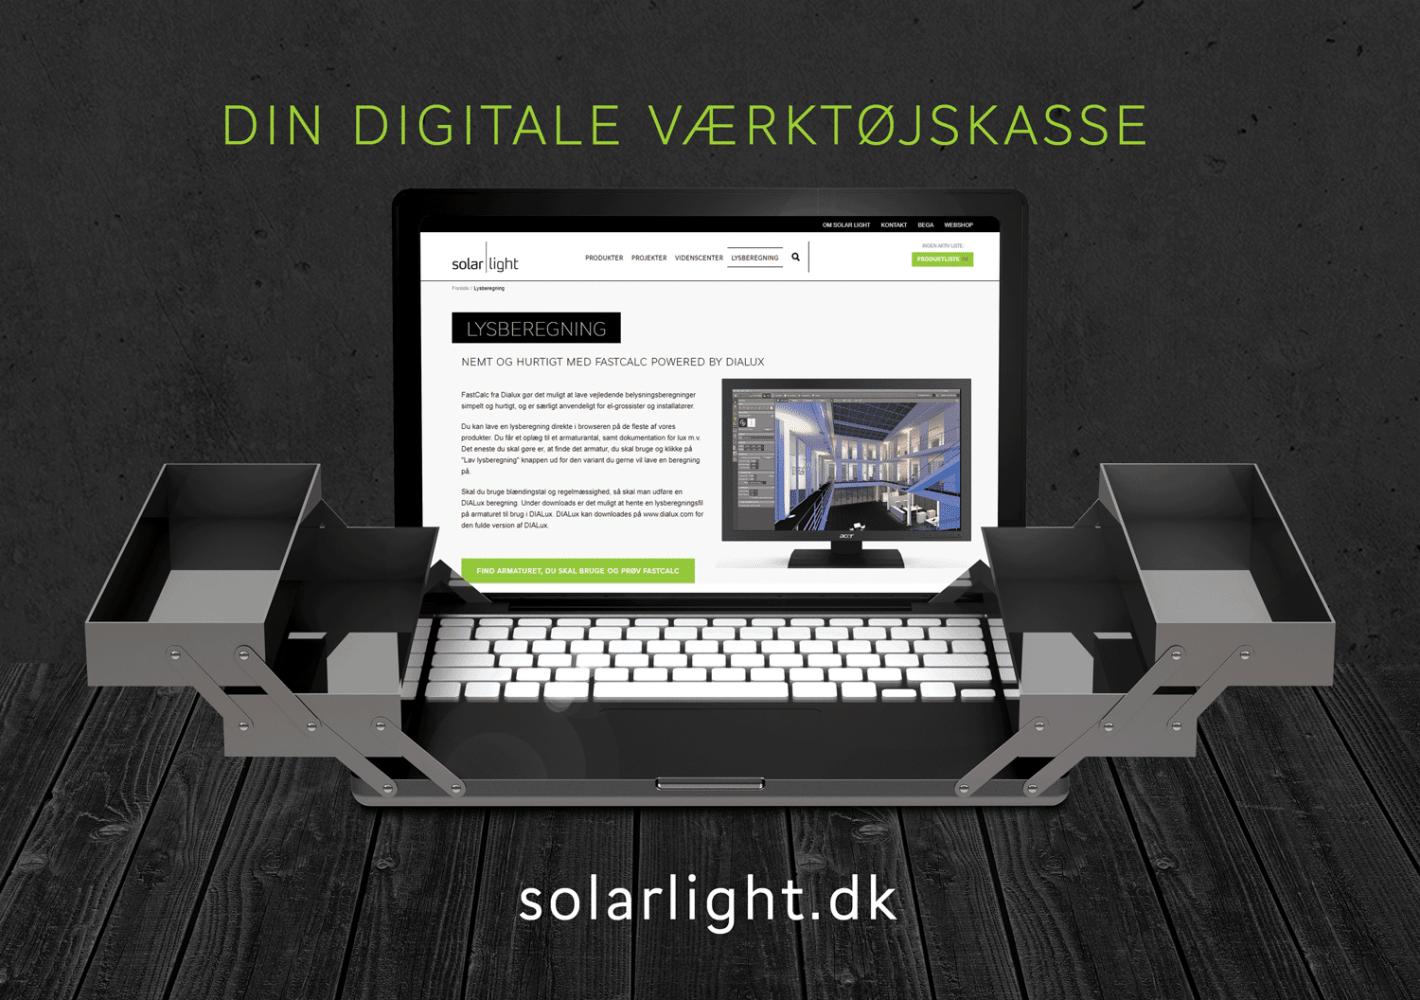 /globalassets/dk/koncepter/solar-light/solarlight_varktojskasse_1500x1056px.png